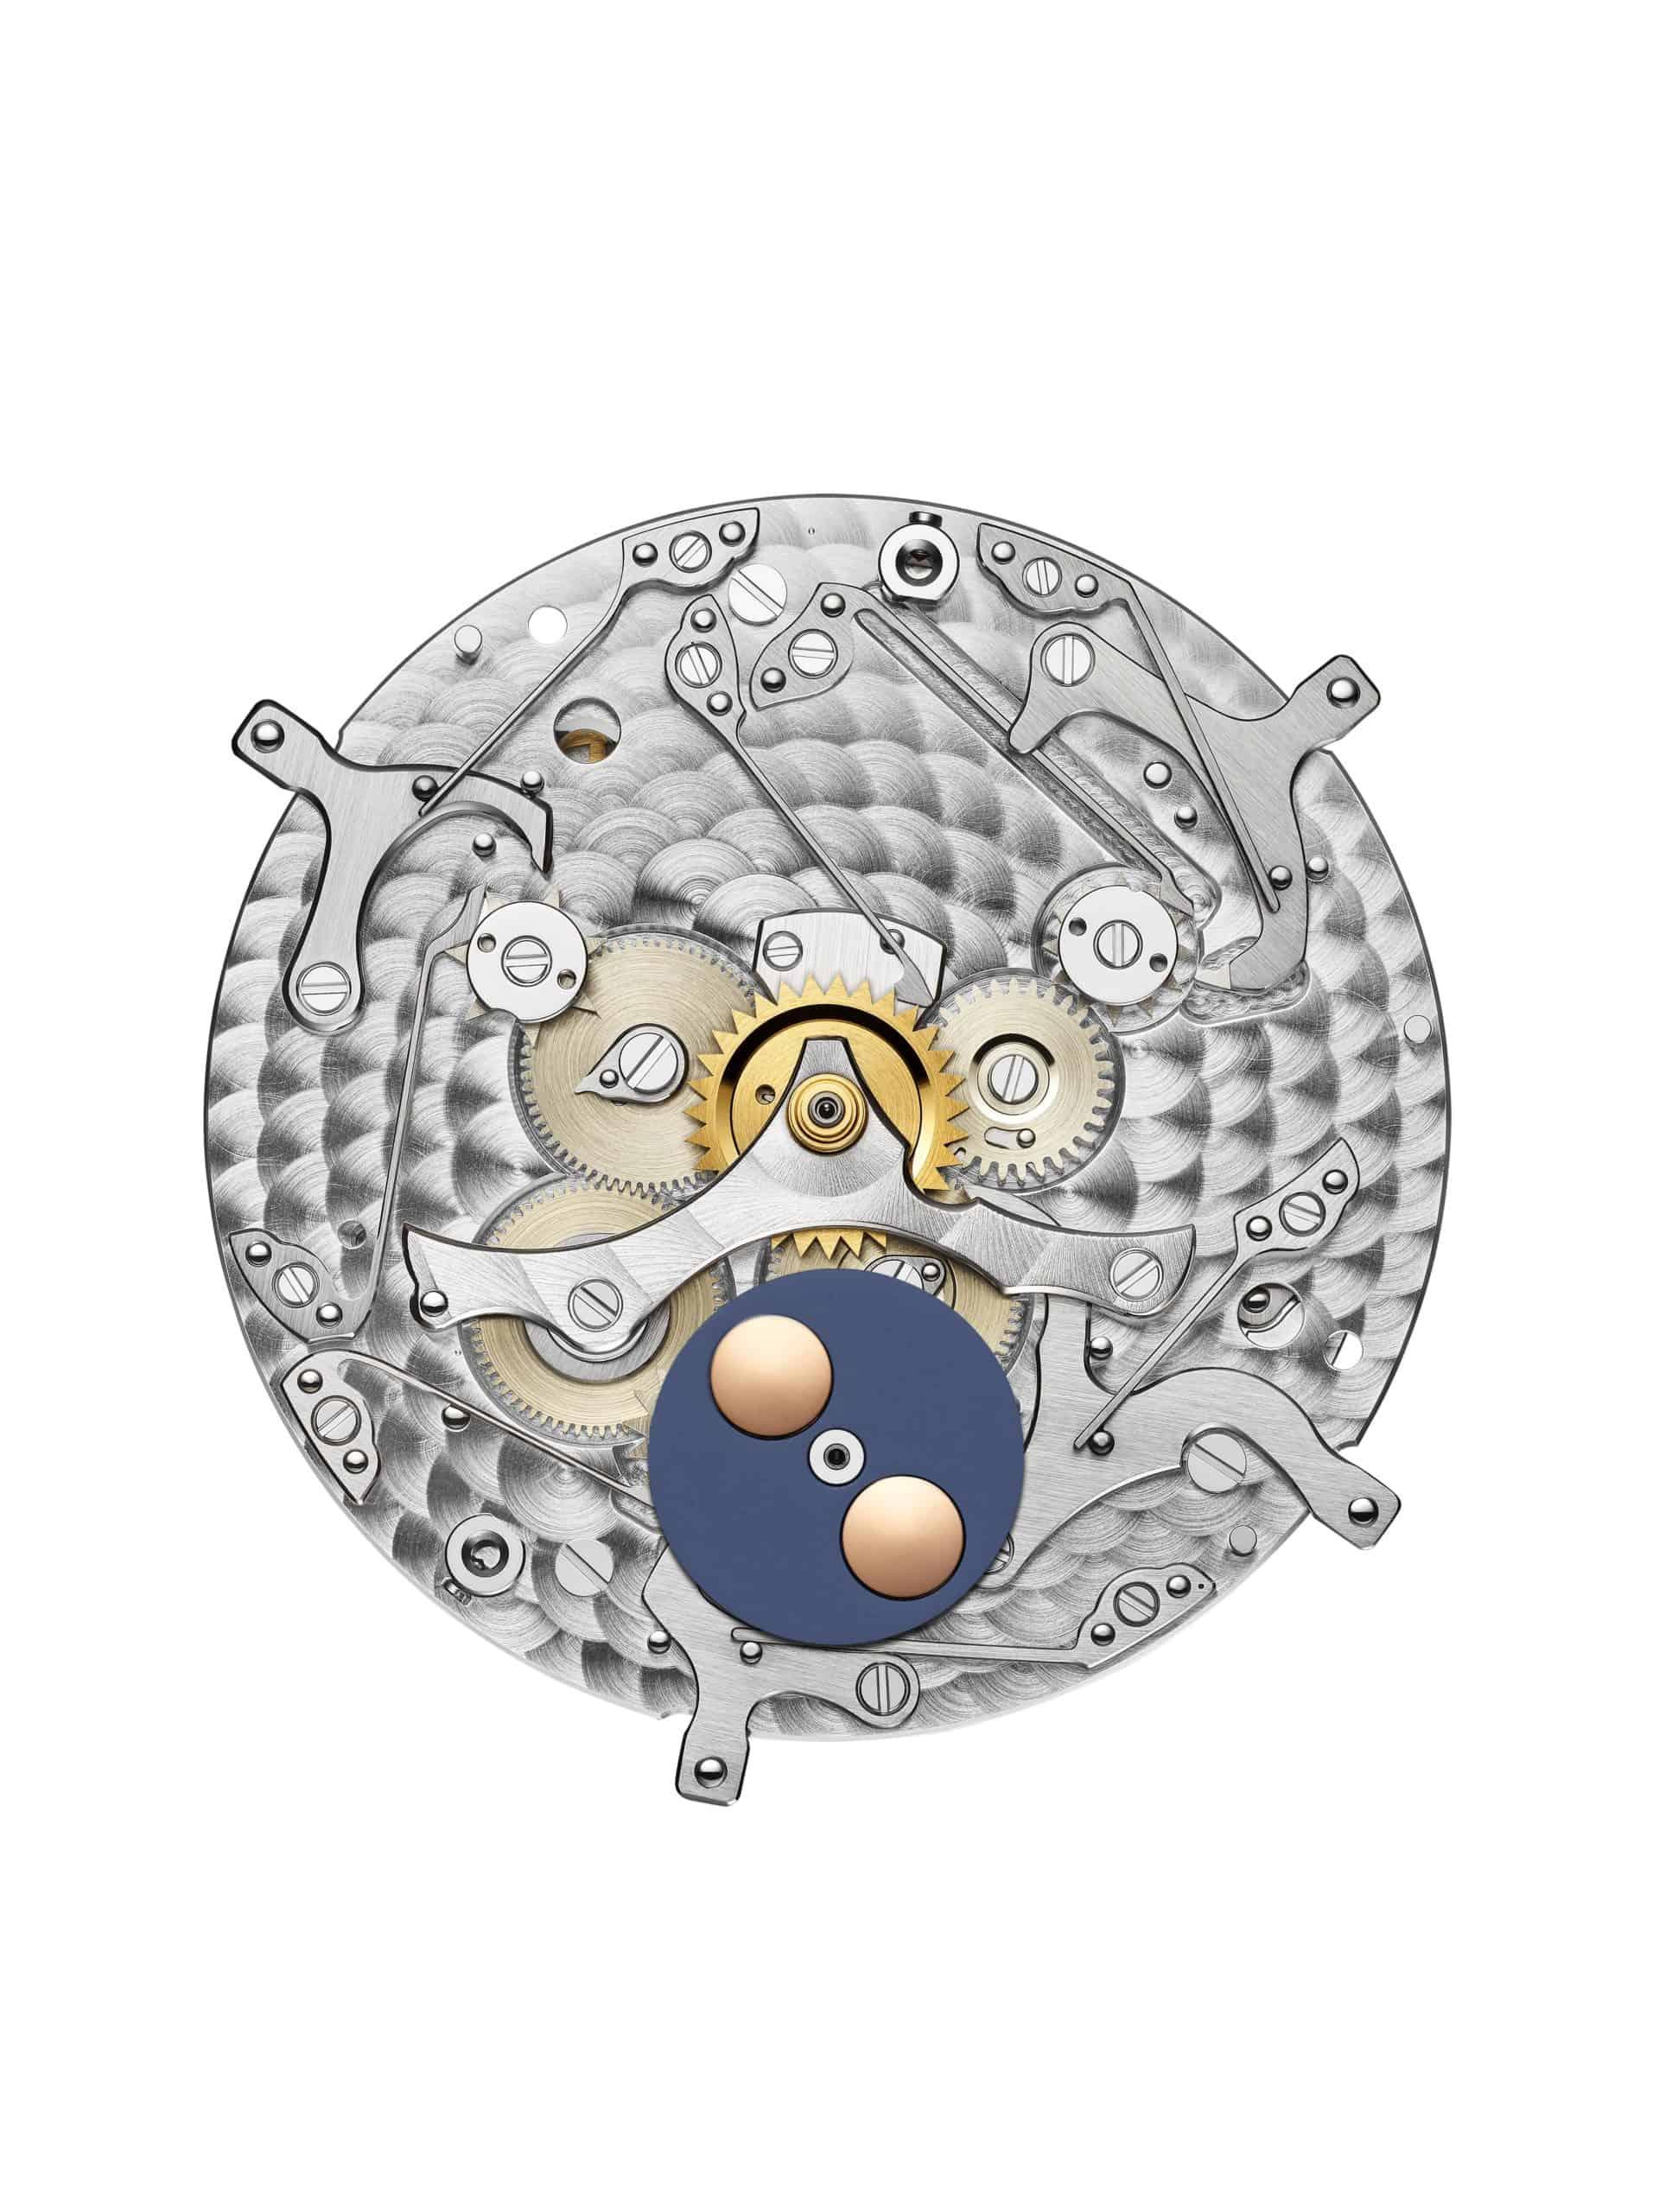 Vacheron Constantin FiftySix Automatik Vollkalender Kaliber 2460 QCL1 pink gold R tr 1651472